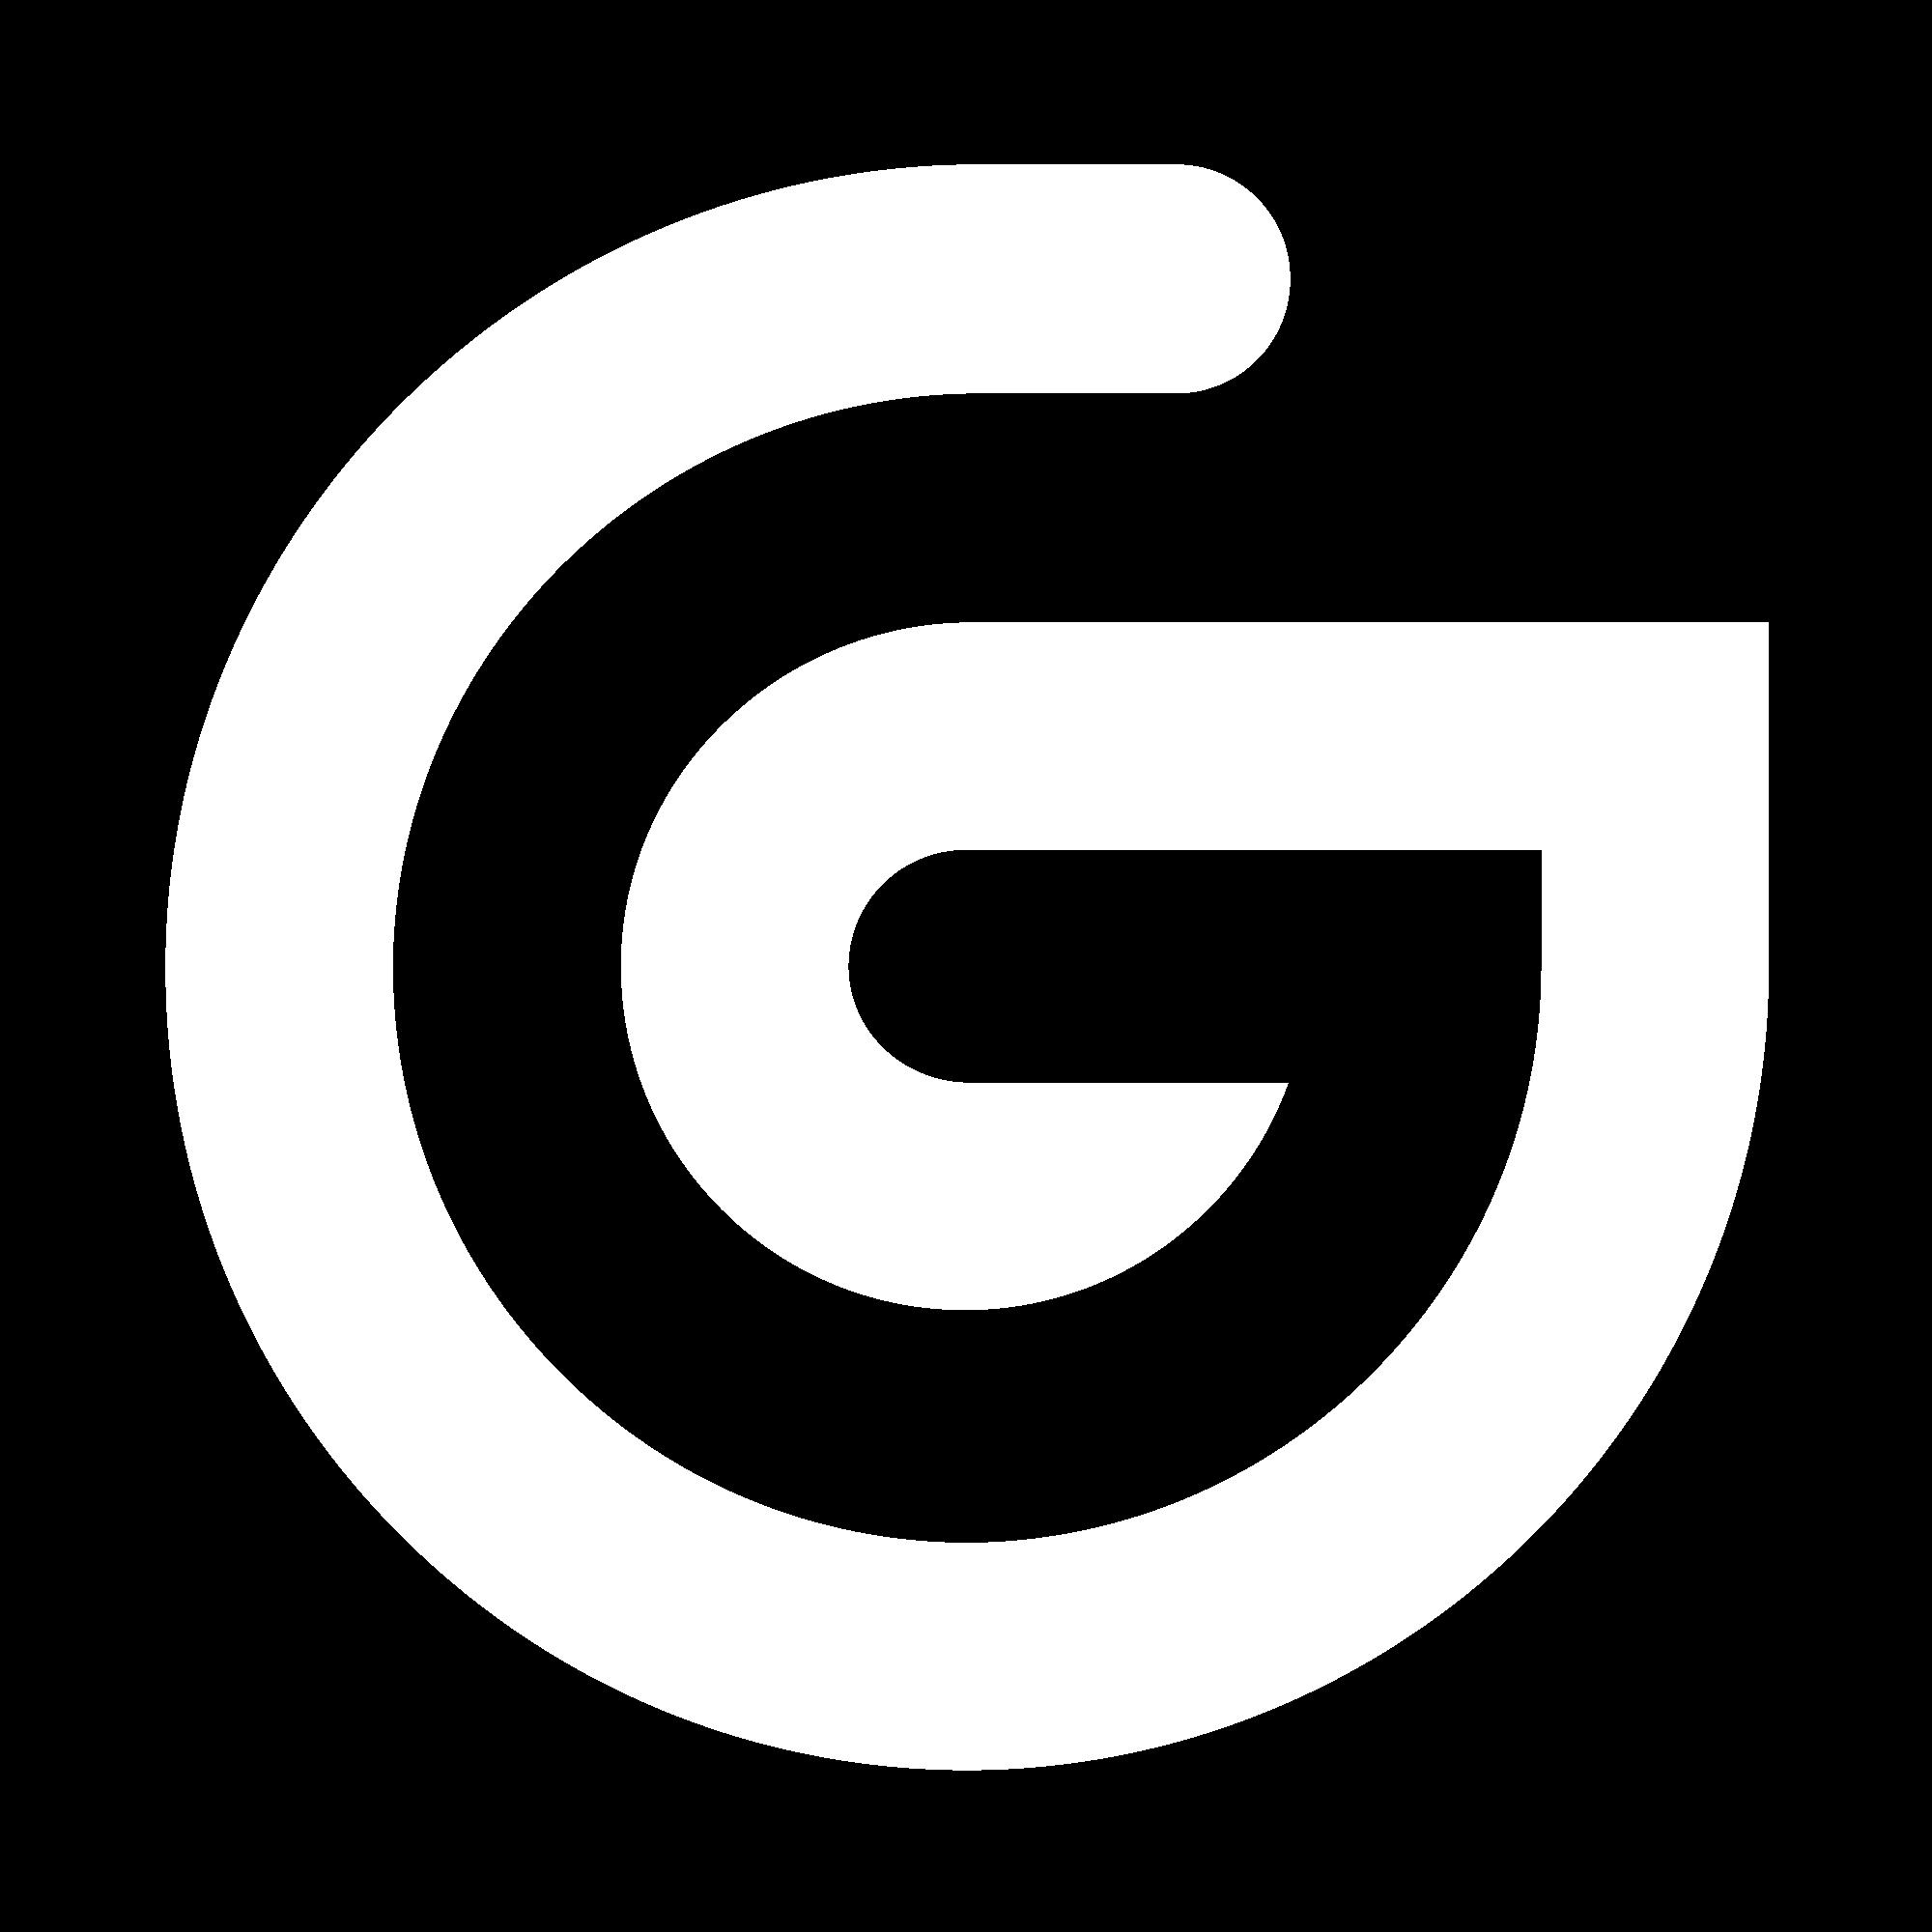 Icone gaiago